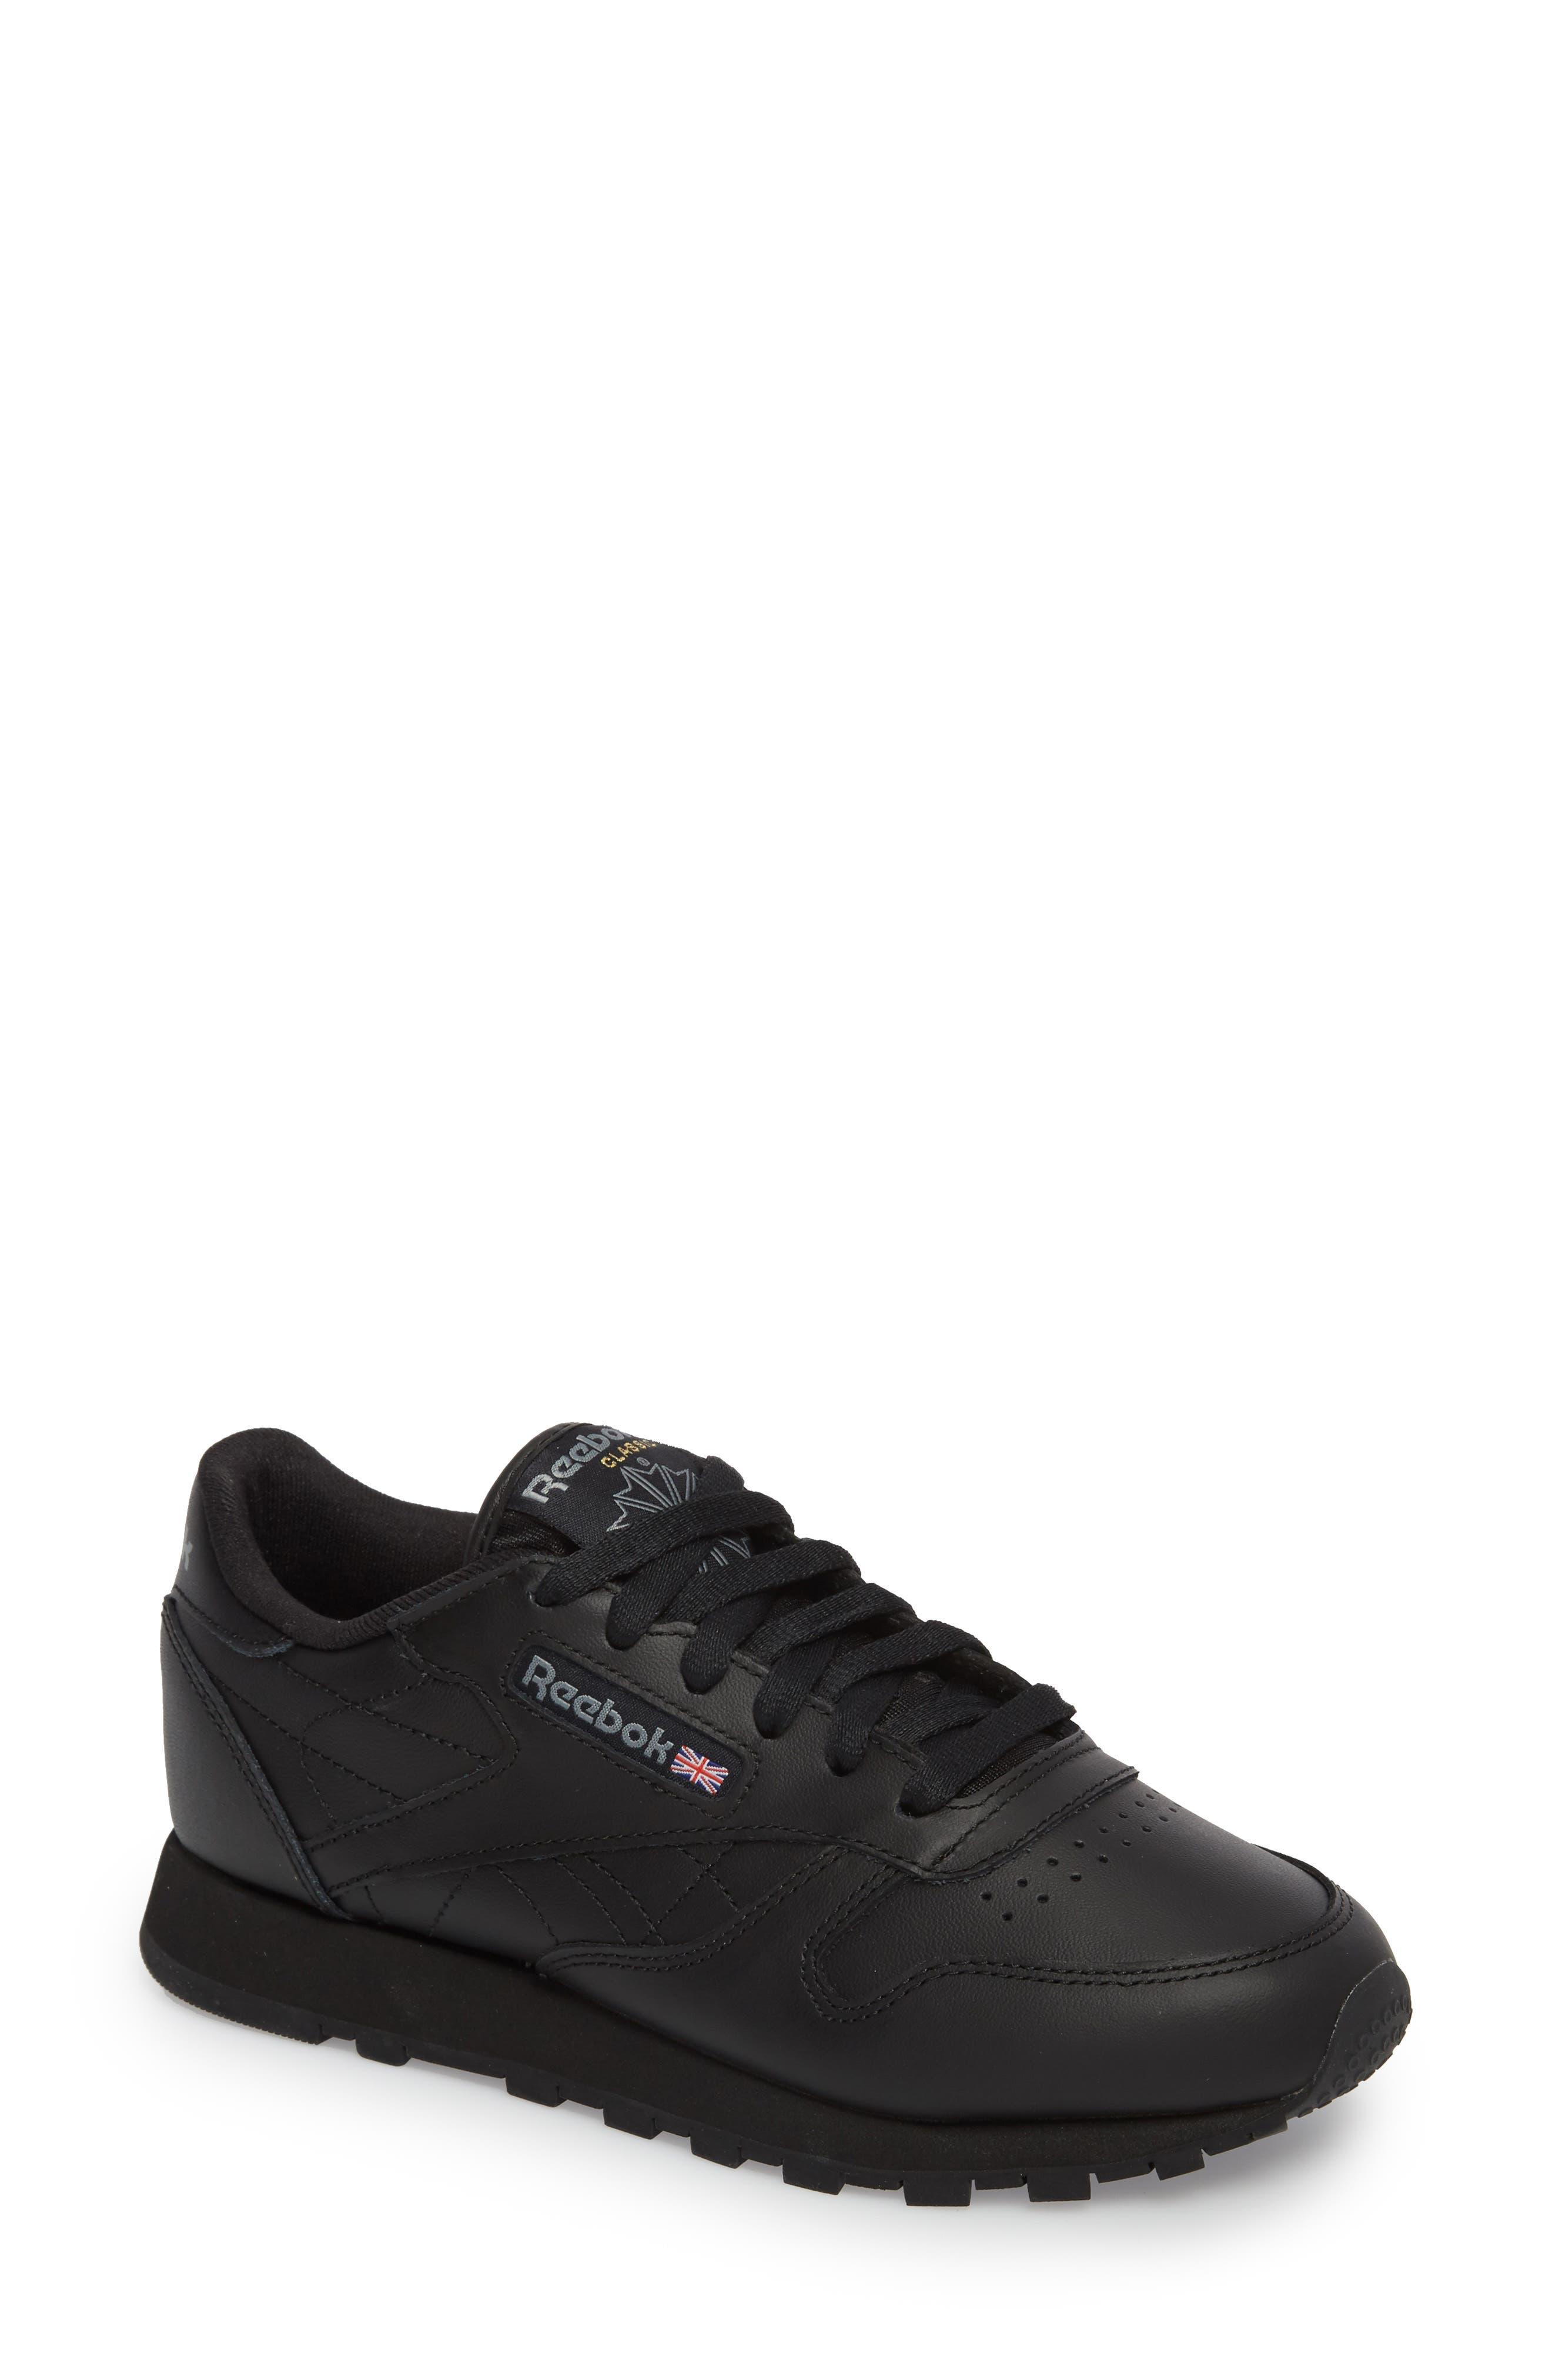 Reebok Classic Leather Sneaker, Black